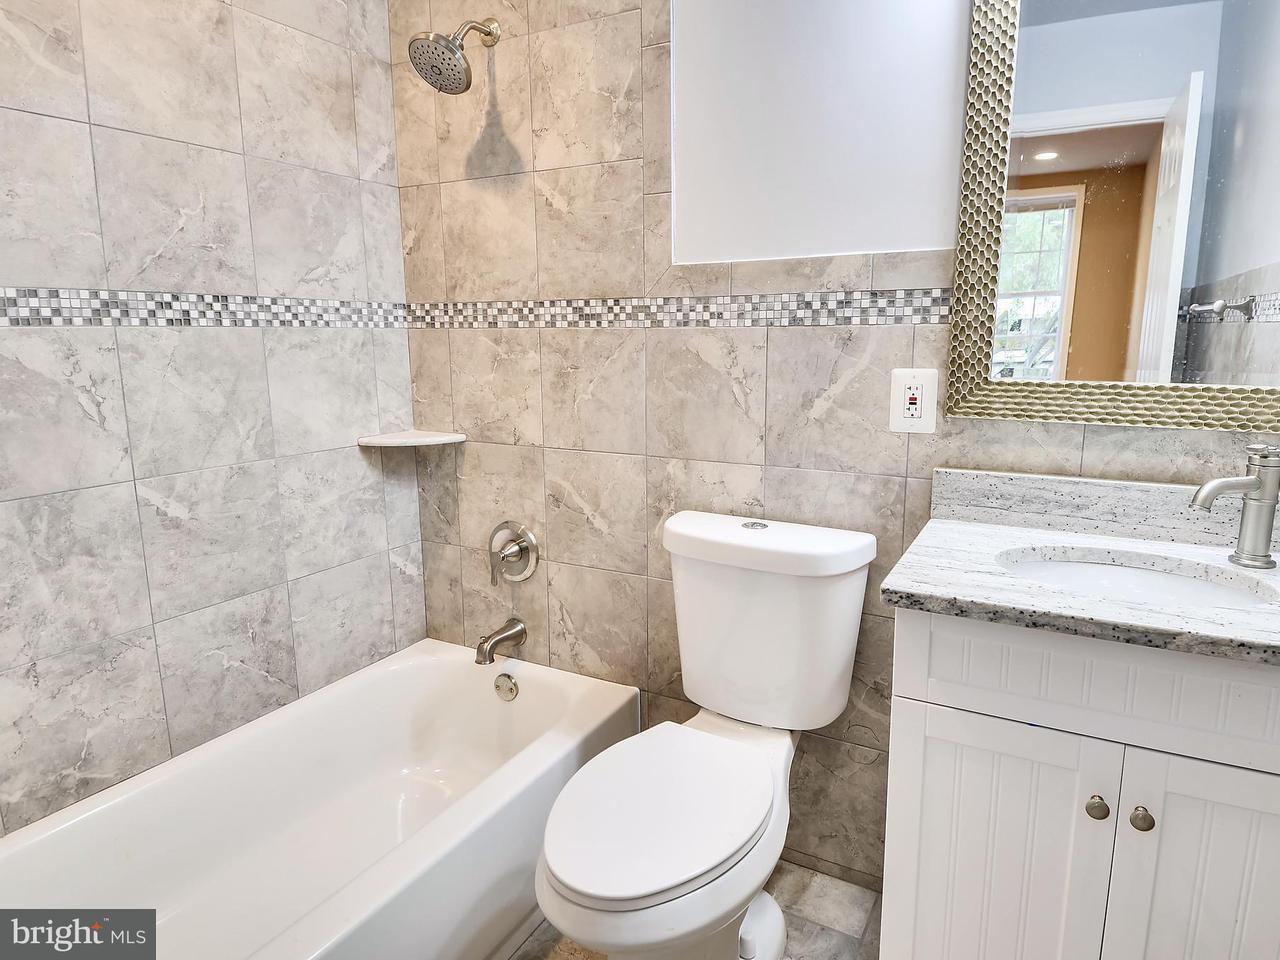 Additional photo for property listing at 527 23rd Pl Ne 527 23rd Pl Ne Washington, Distrito De Columbia 20002 Estados Unidos